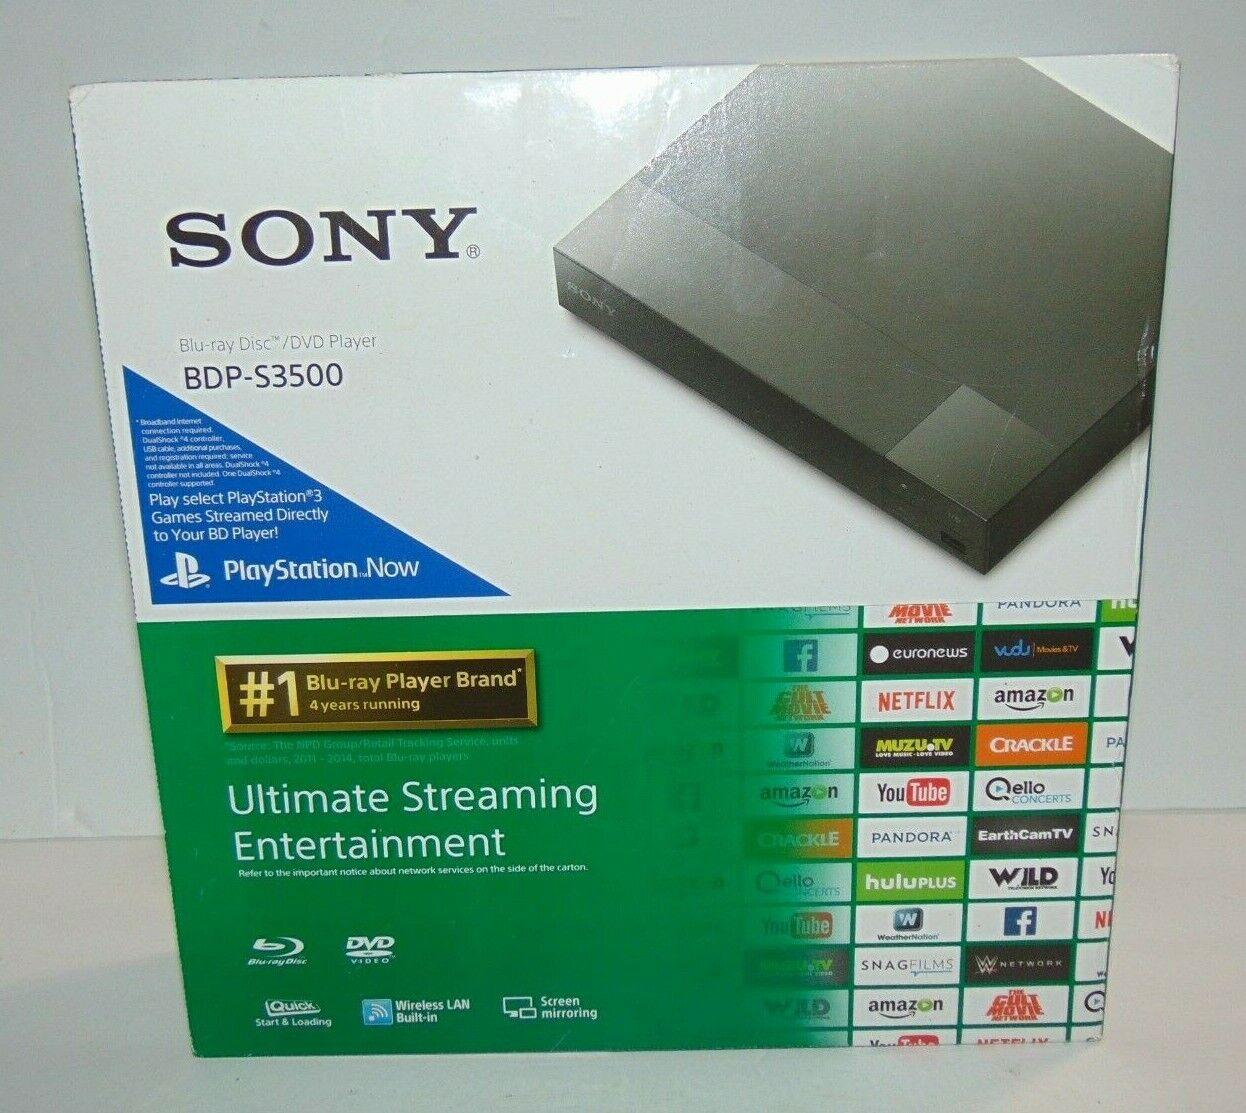 Sony BDP-S3500 Blu-Ray / DVD Player WiFi Streaming Screen Mirroring dvd mirroring player screen sony streaming wifi